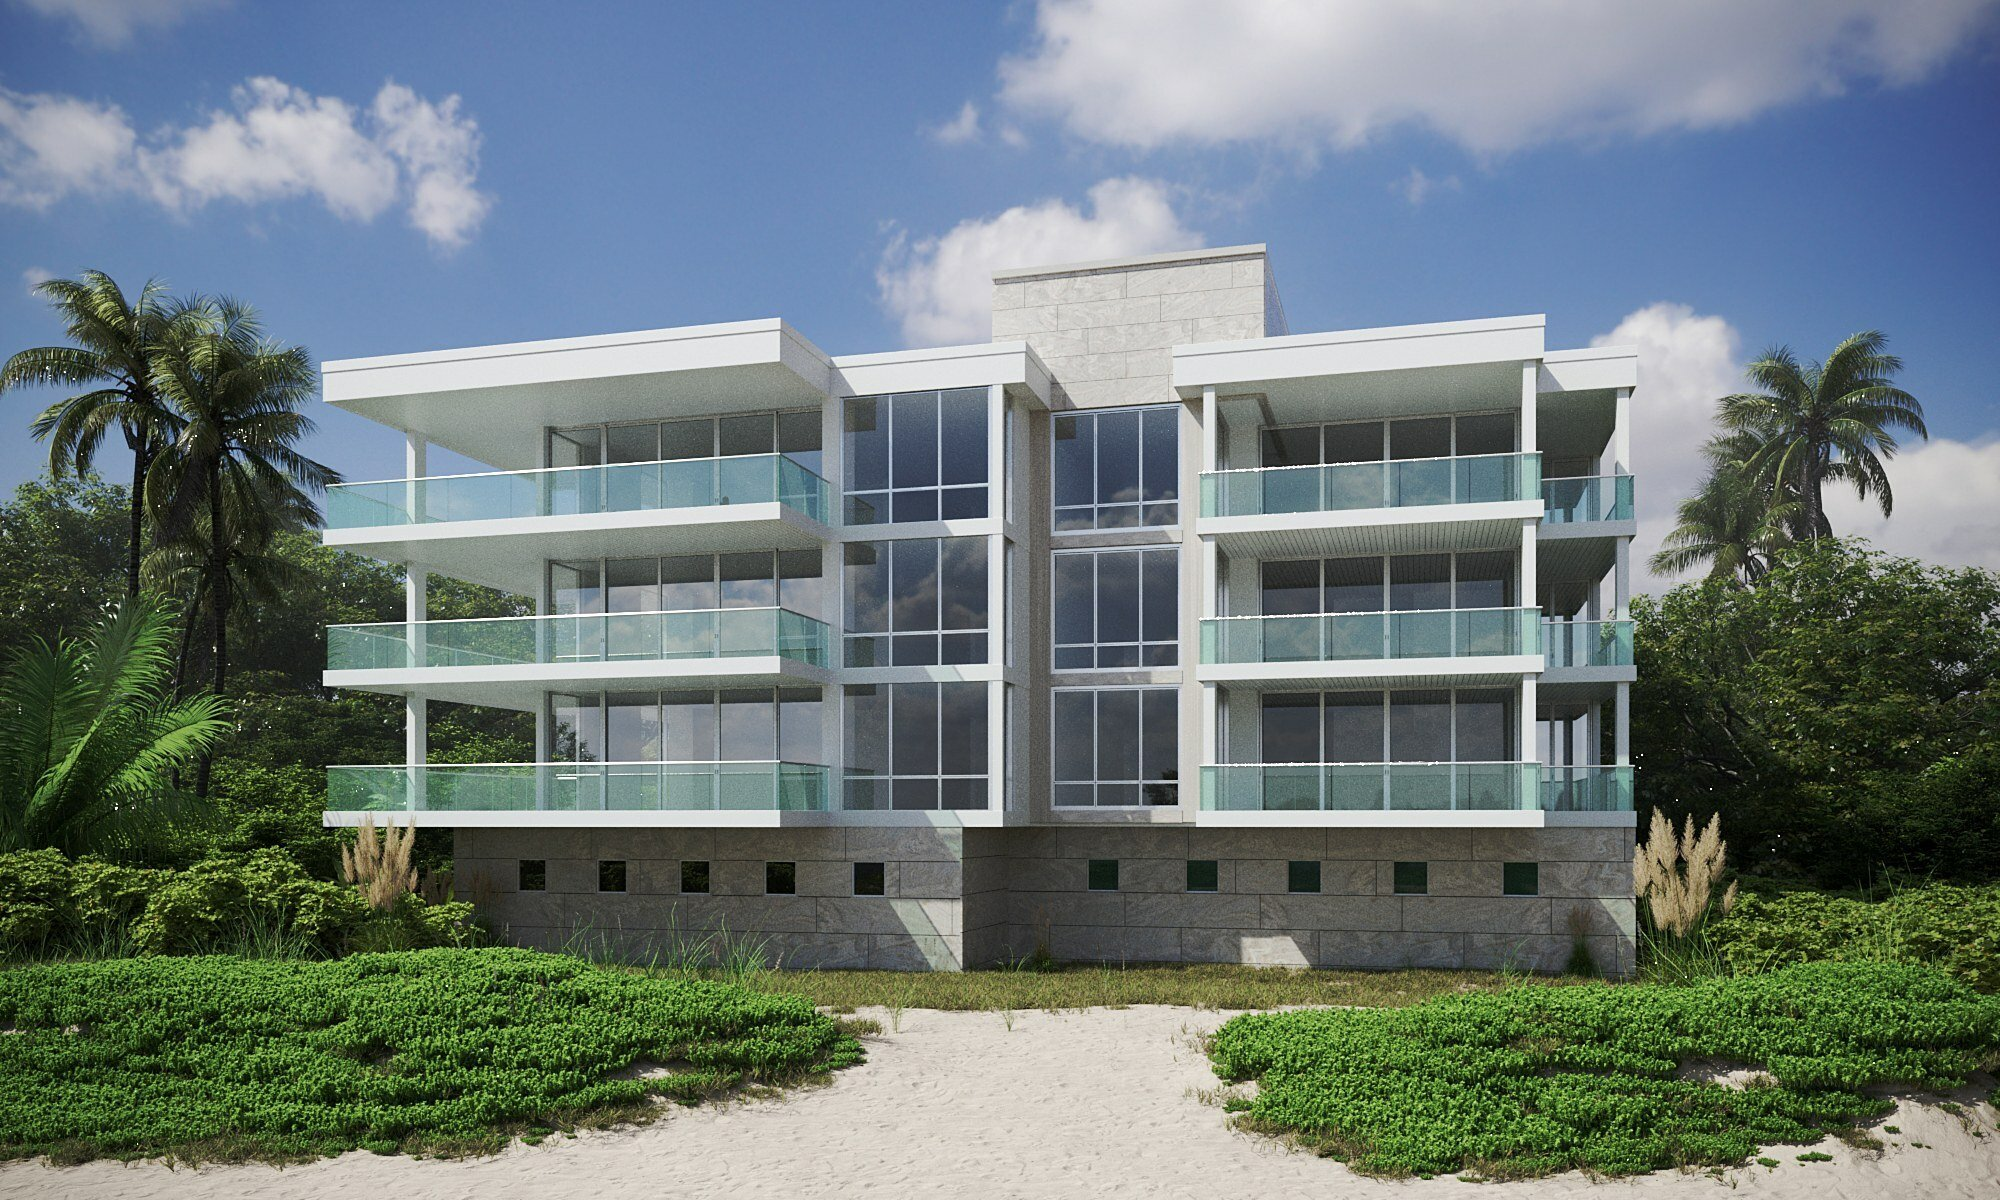 Vero Beach, Florida, United States 1 - 11331985